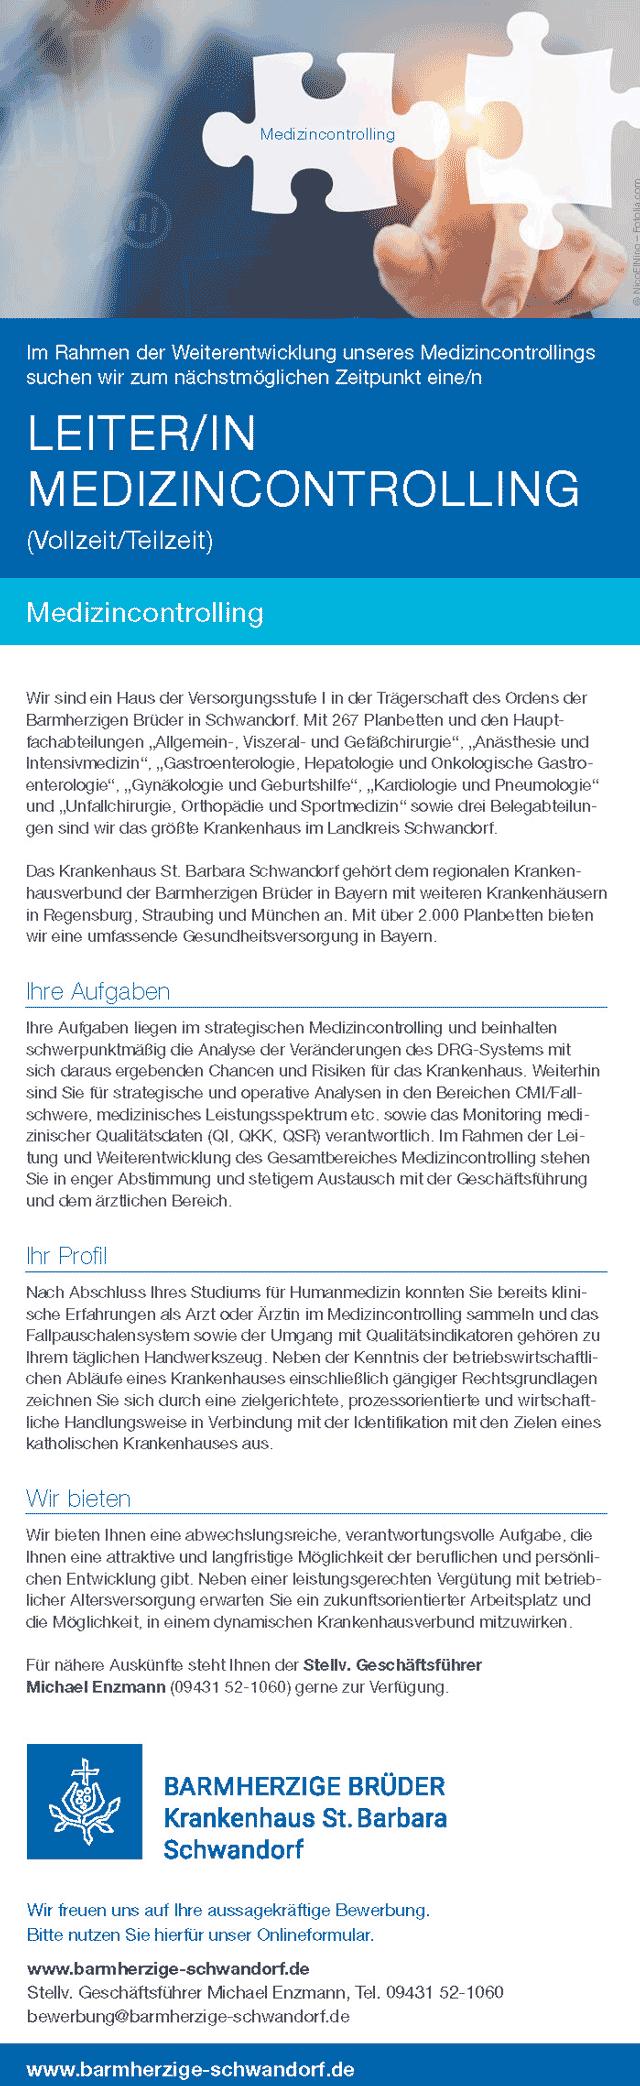 Krankenhaus St. Barbara Schwandorf: Leitung Medizincontrolling (w/m)